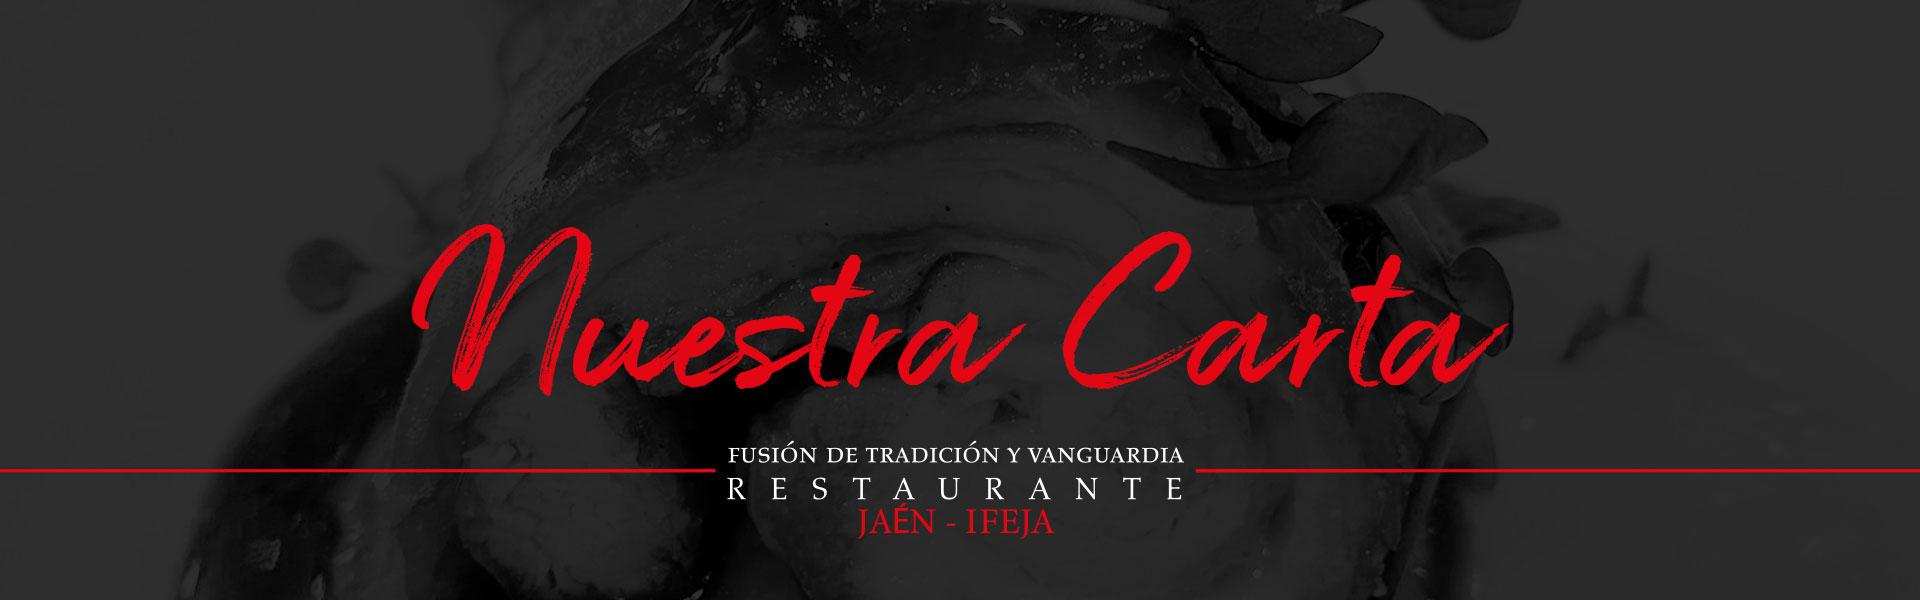 Cabecera-Nuestra-Carta-JAEN